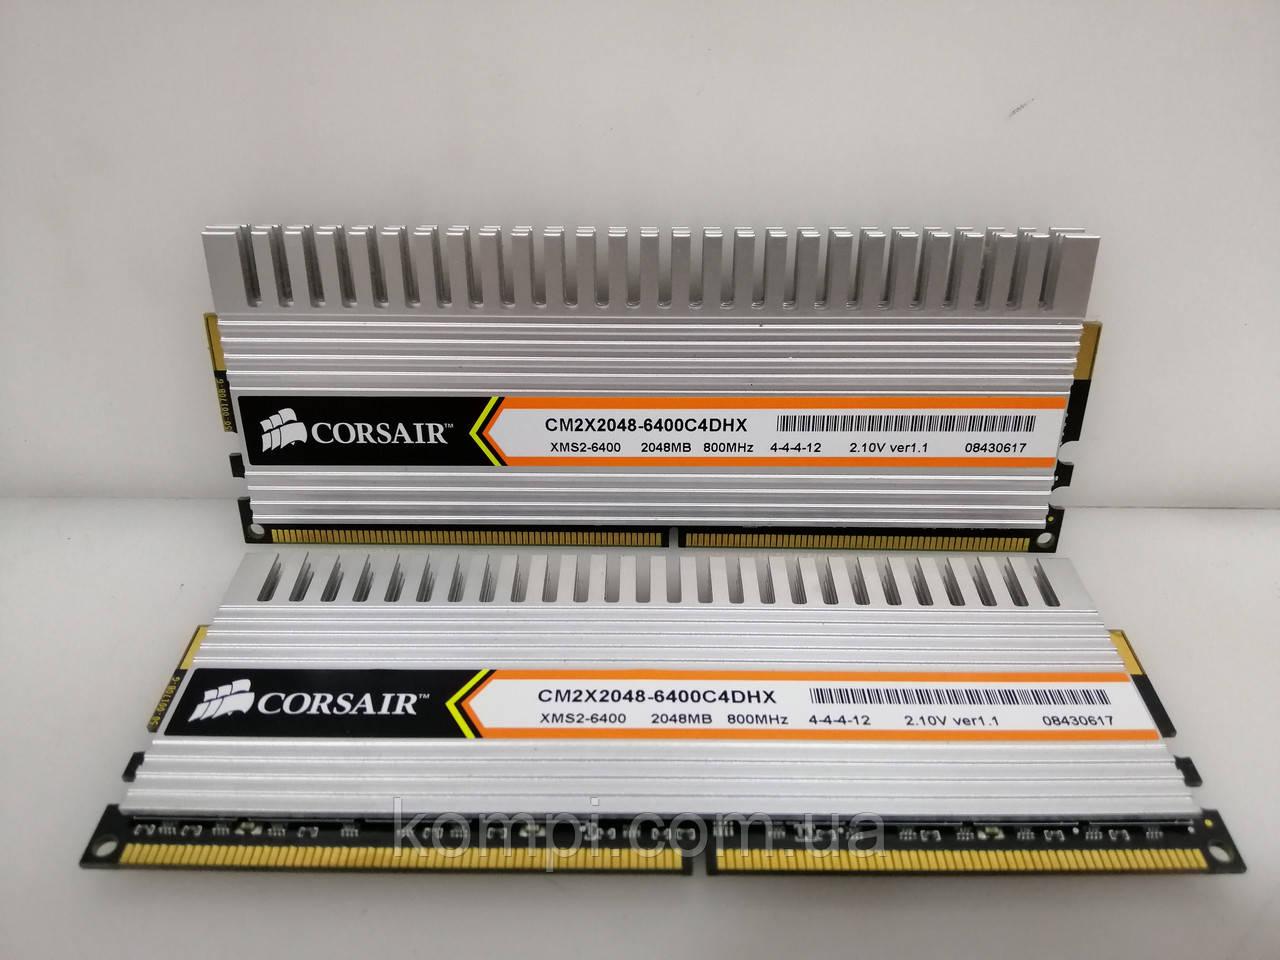 Оперативная память Corsair 4Gb Kit (2x2Gb) ddr2 PC2-6400 CL4 радиатор